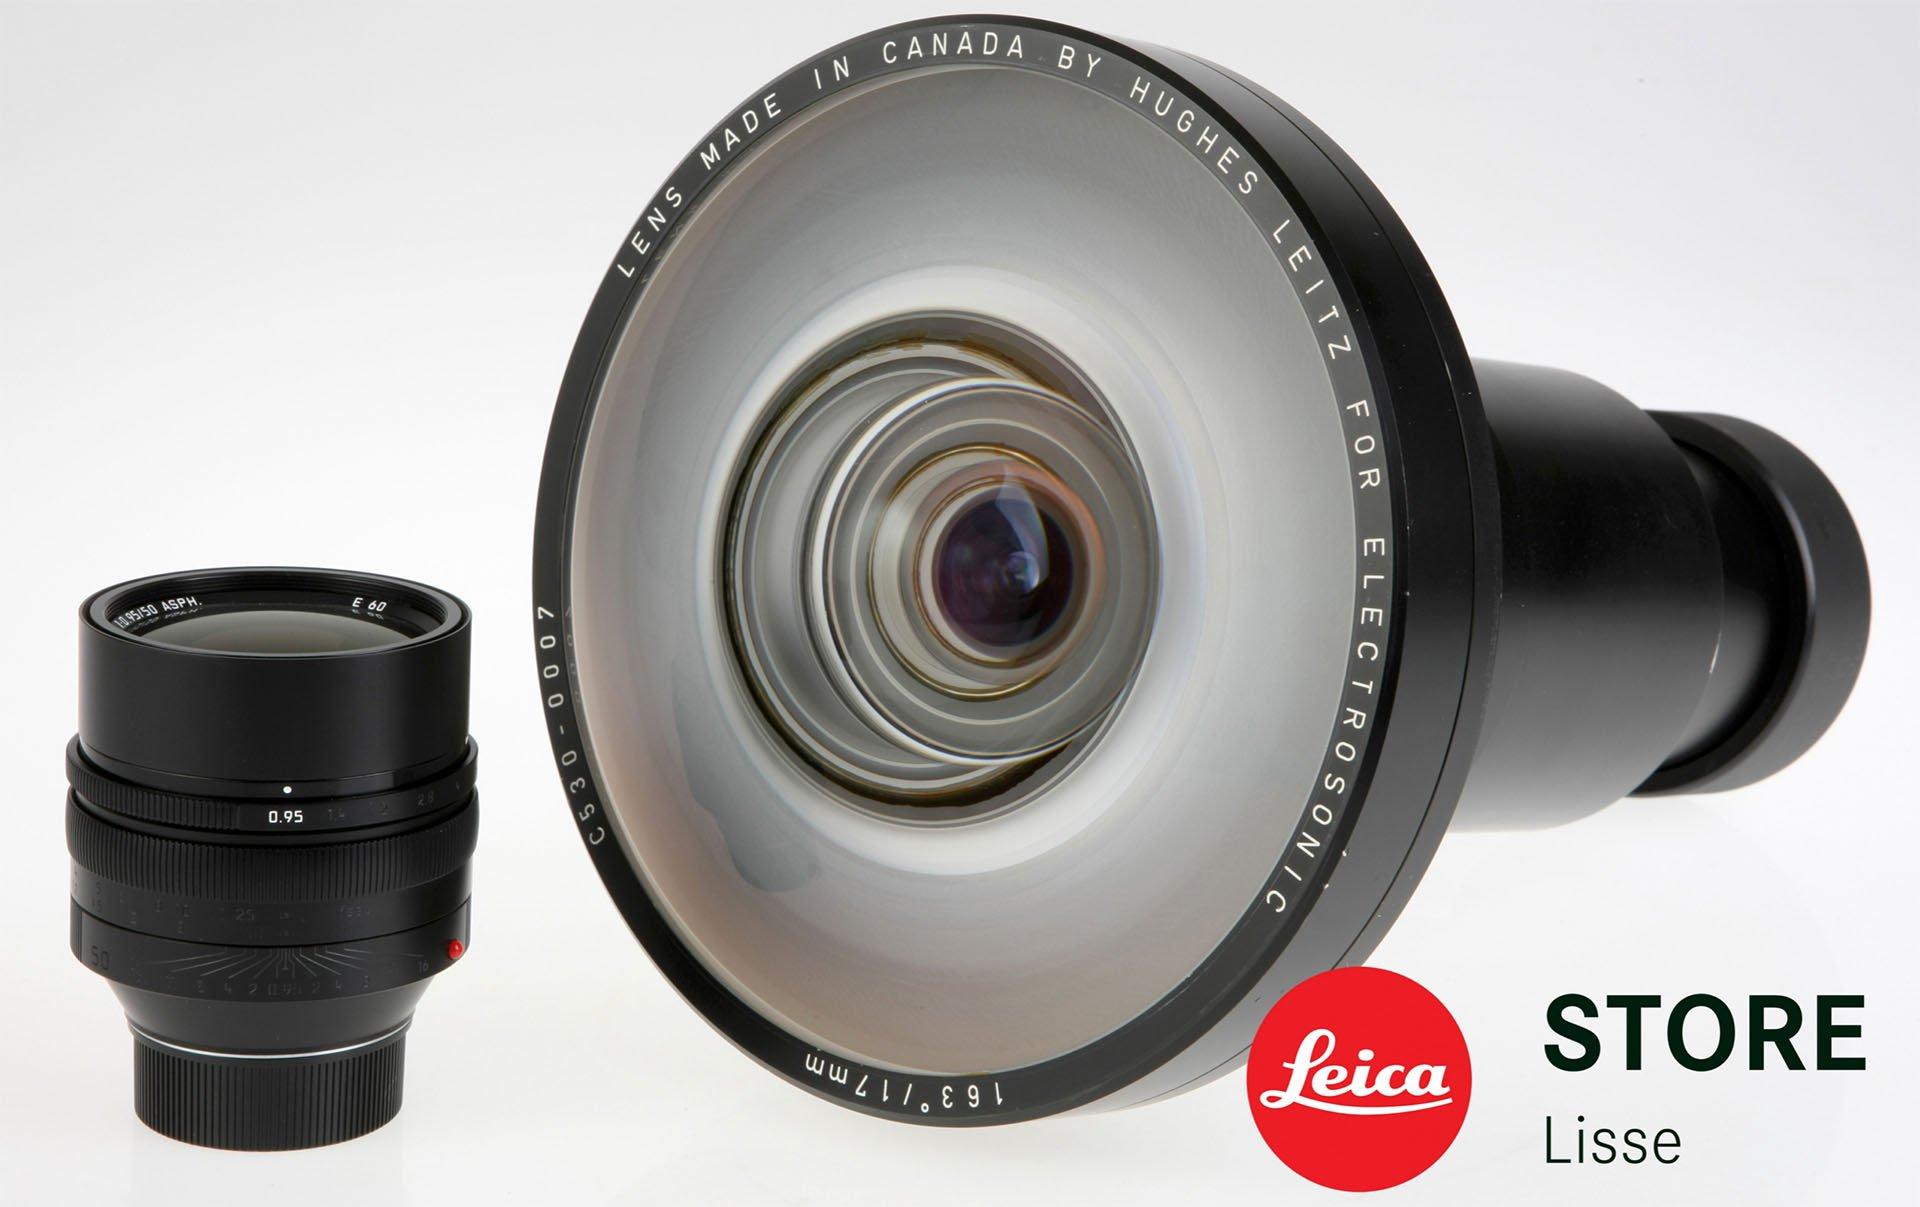 leica-store-lisse-hughes-leitz-17mm-f2-5